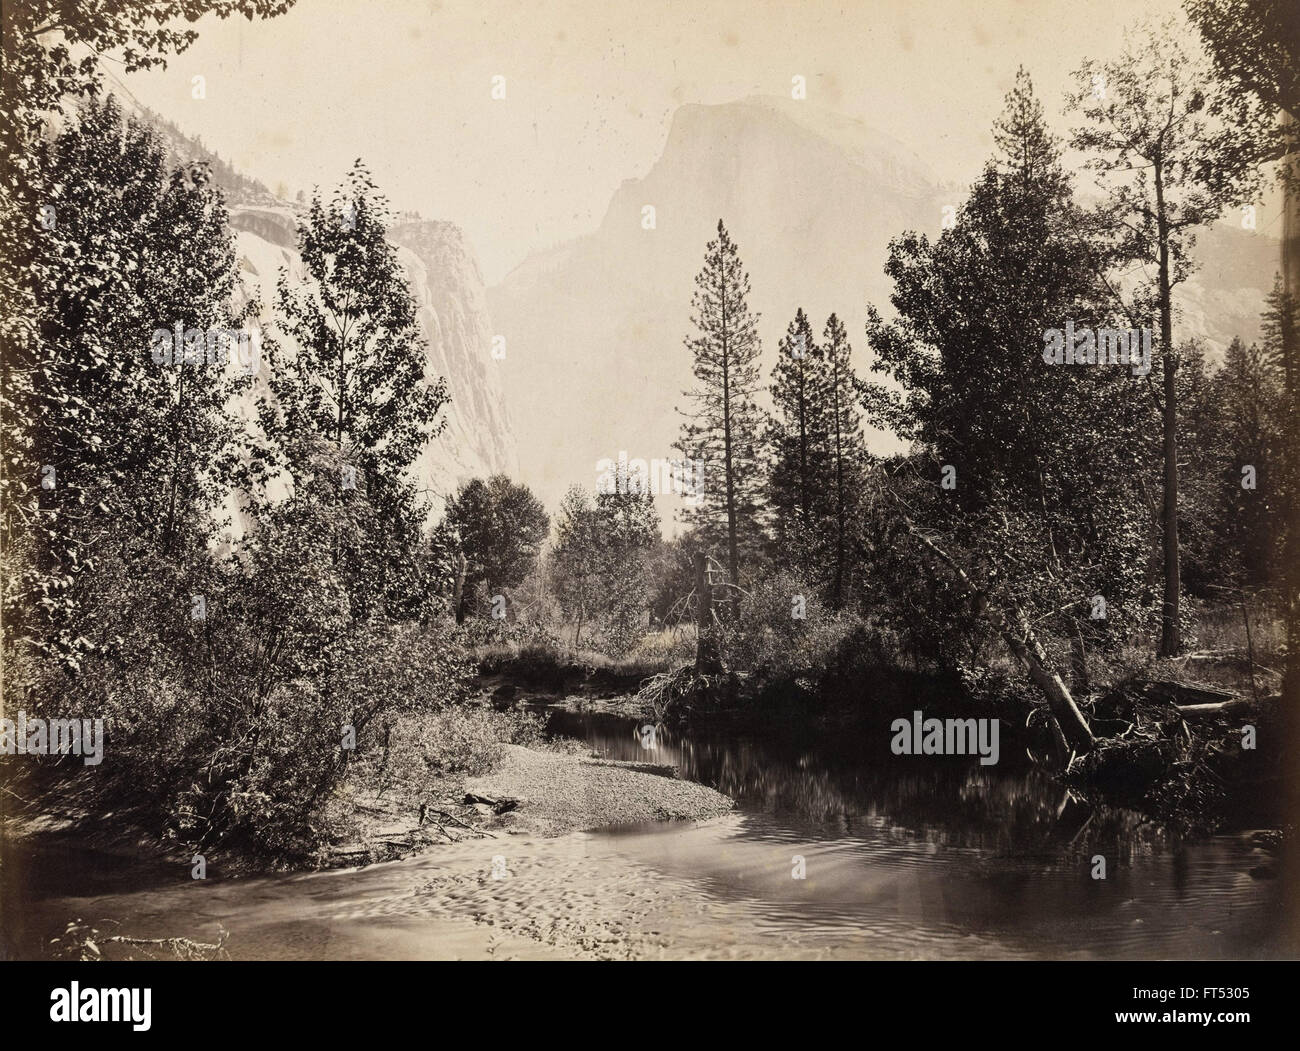 Carleton E. Watkins - Half Dome, 4967 Füße, Yosemite - Cooper-Hewitt National Design Museum Stockbild